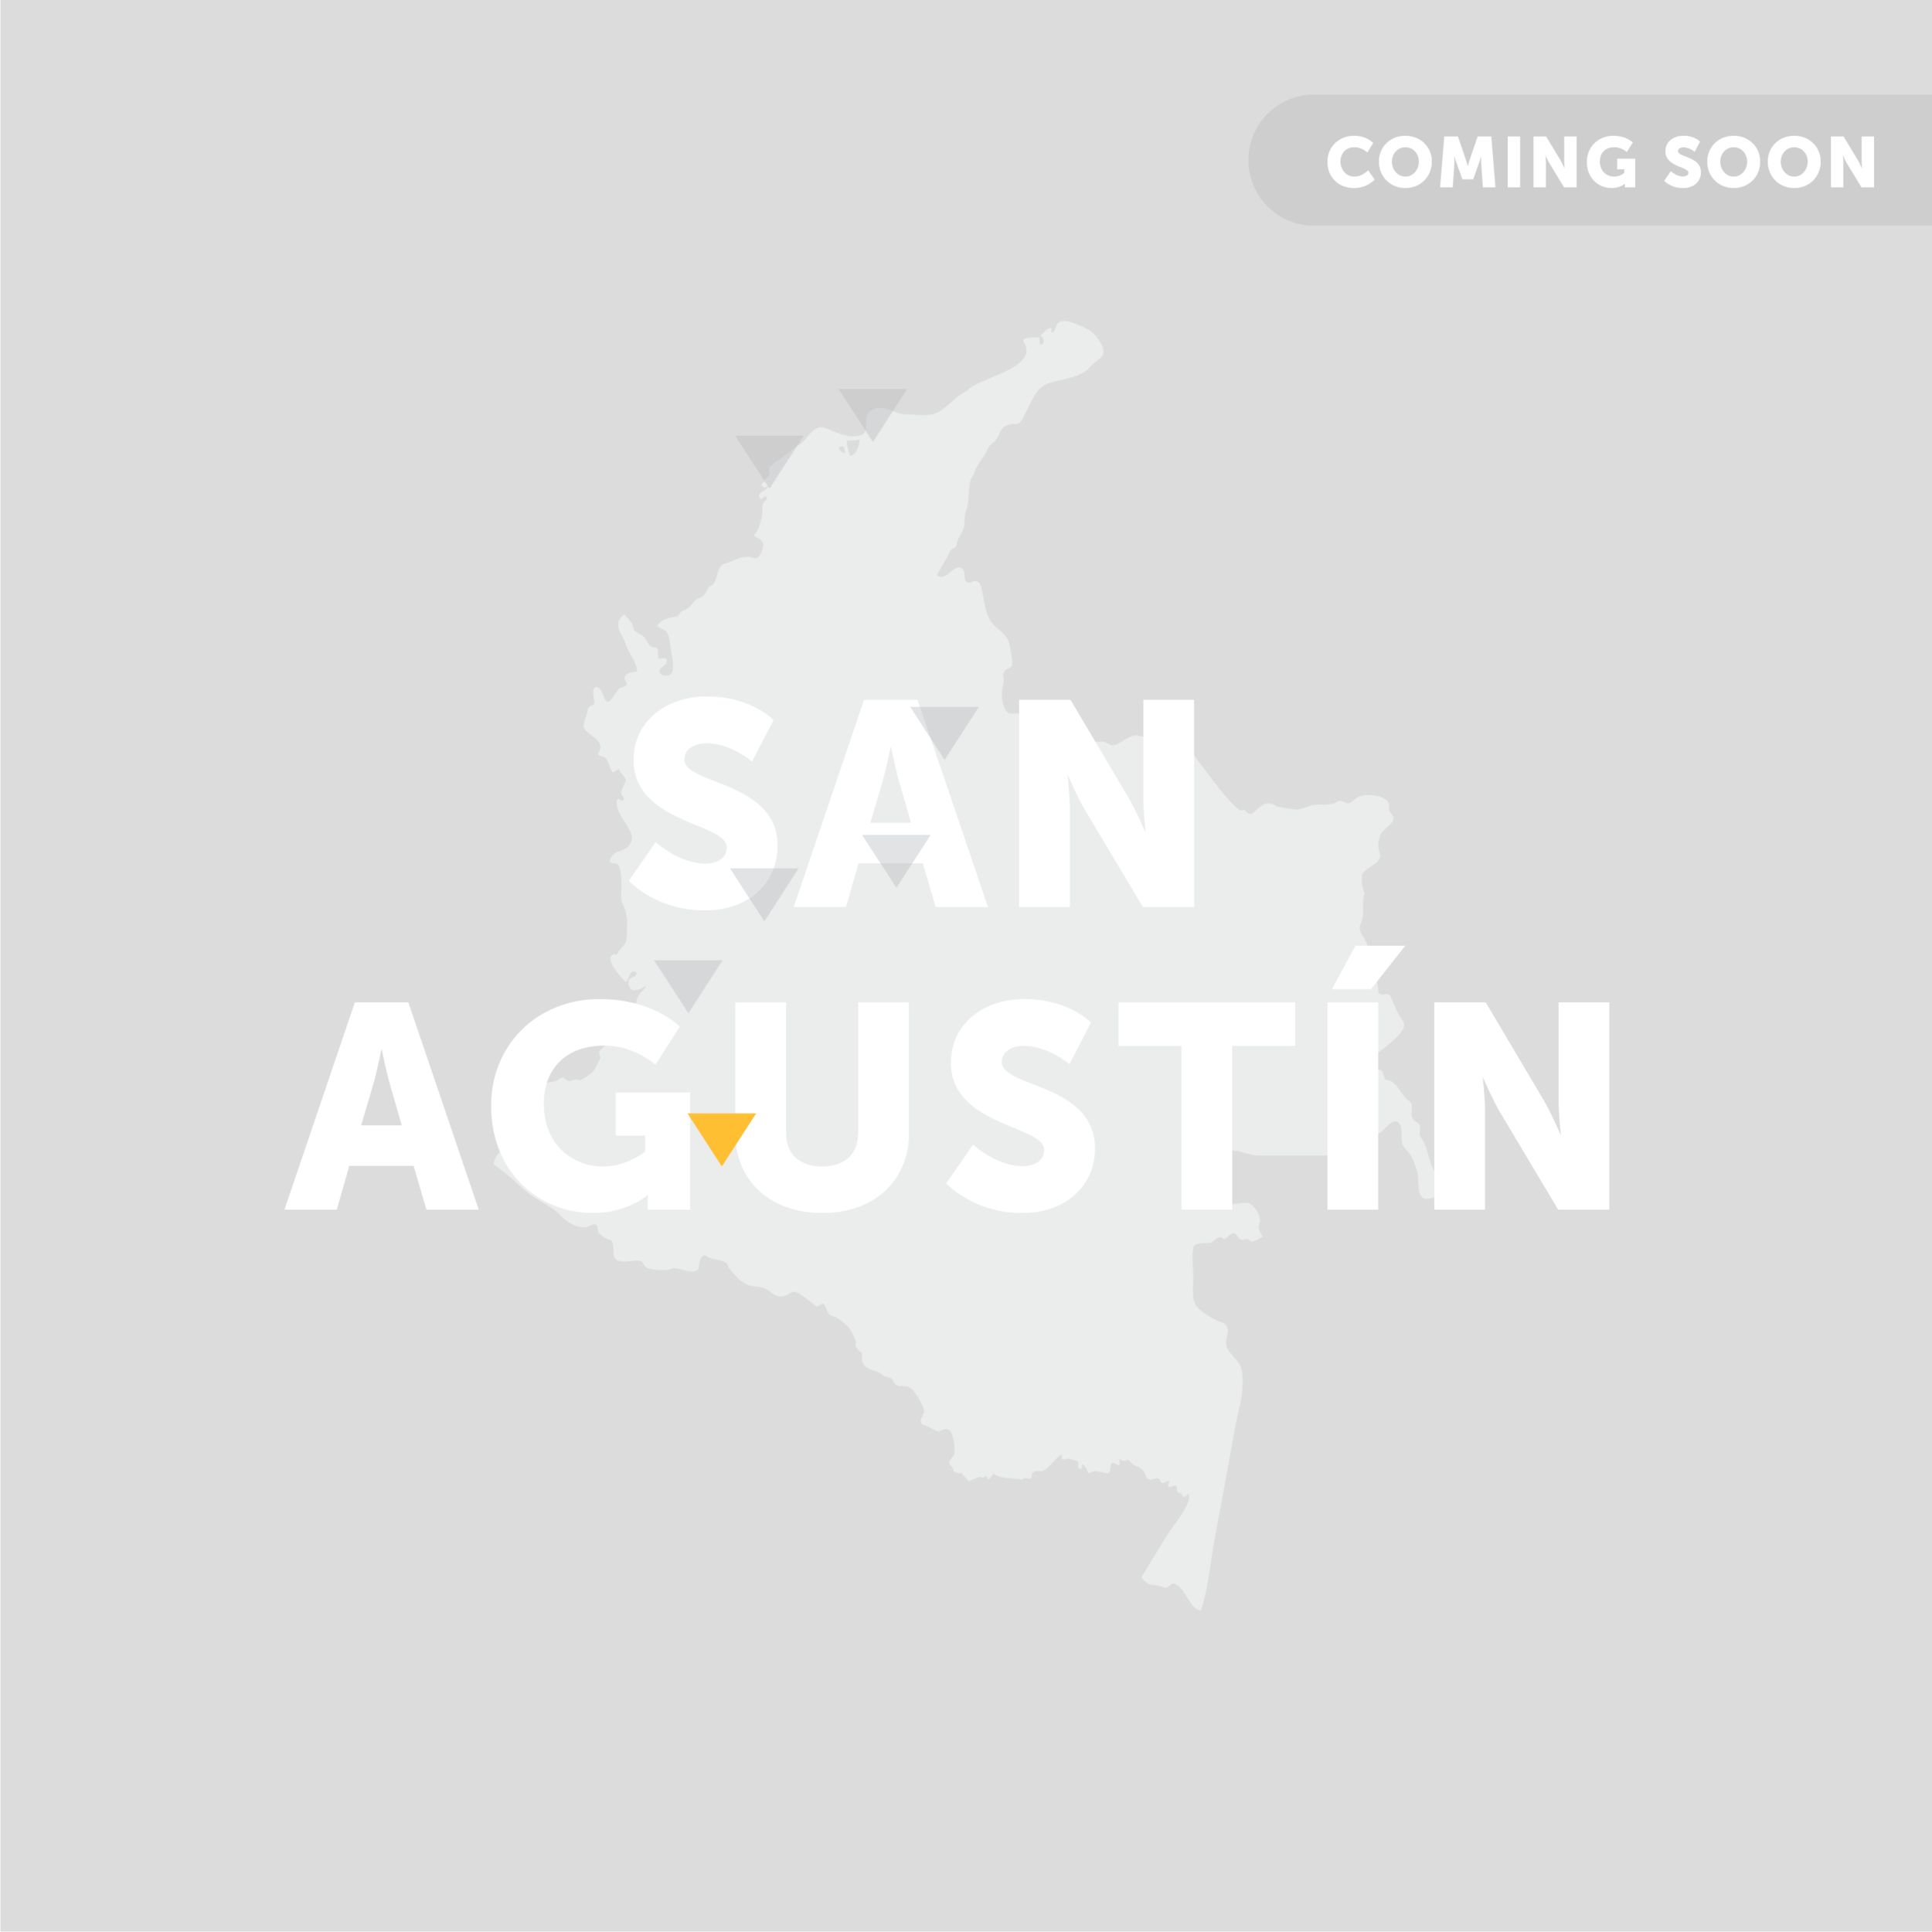 OBELO San Agustin